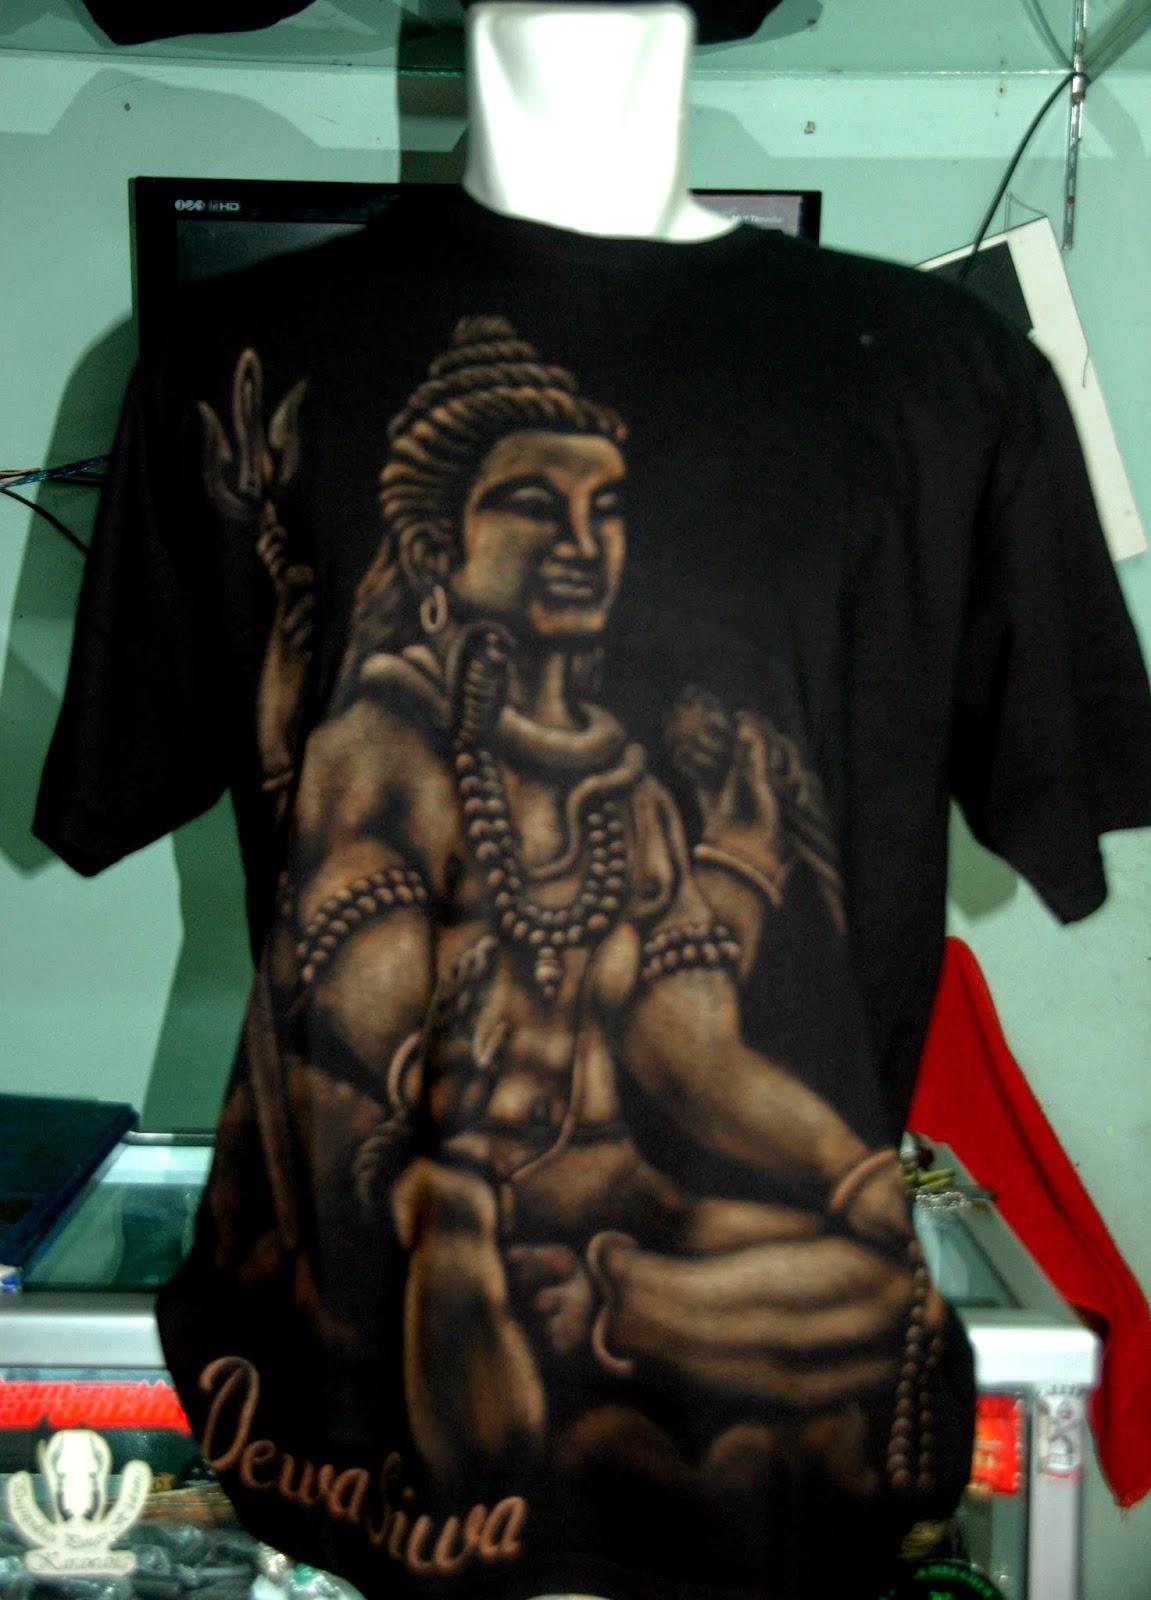 Berita Sunda Musik Kolaborasi Gamelan Tradisional Sunda Dan Musik Kaos Lukis Cabut Warna Motif Dewa Siwa